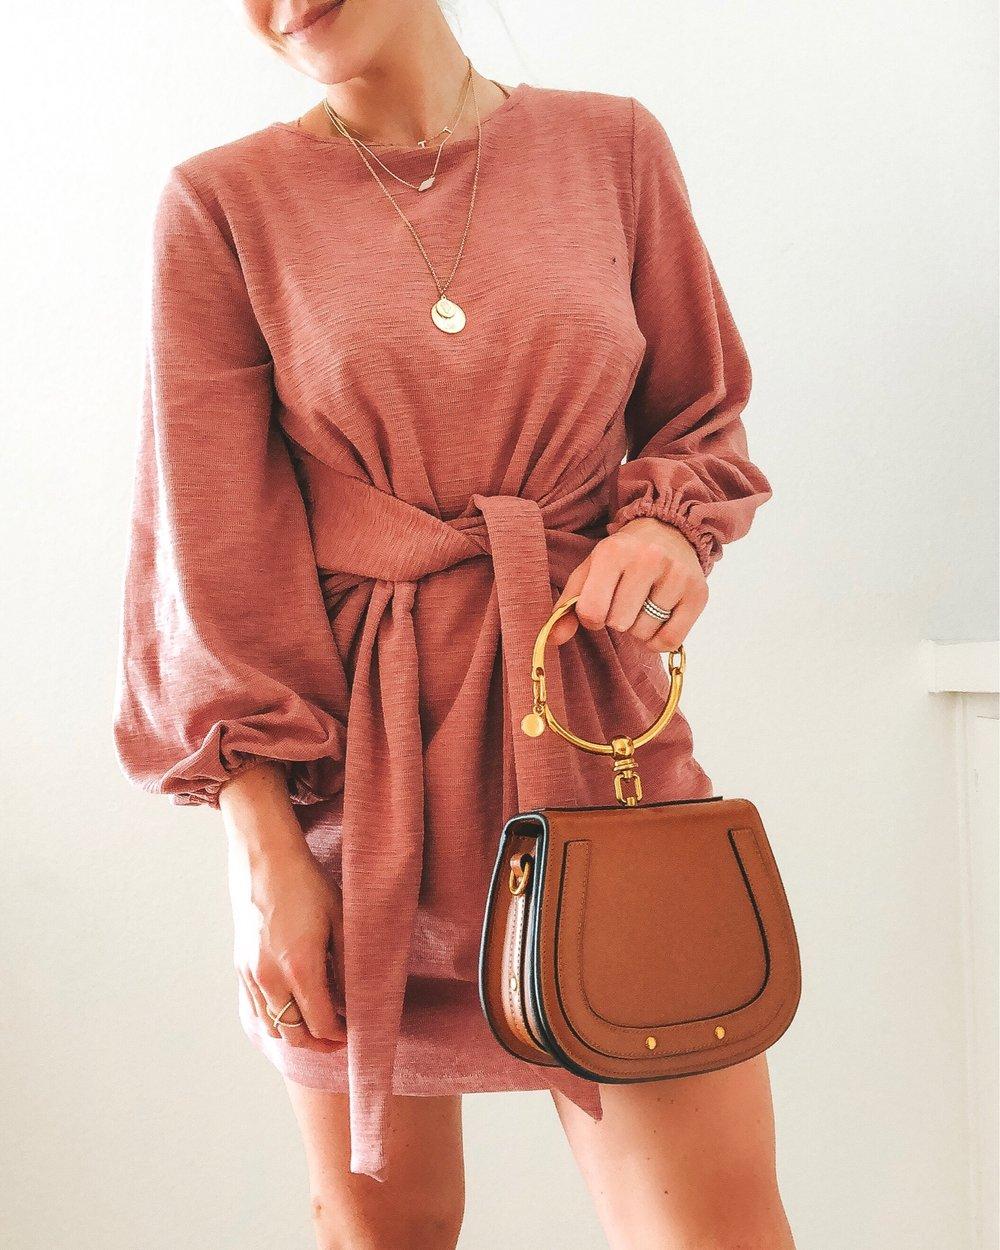 Amazon fashion finds.  Affordable fashion on Amazon.  Blush pink tie waist dress.  Chloe bracelet bag dupe.